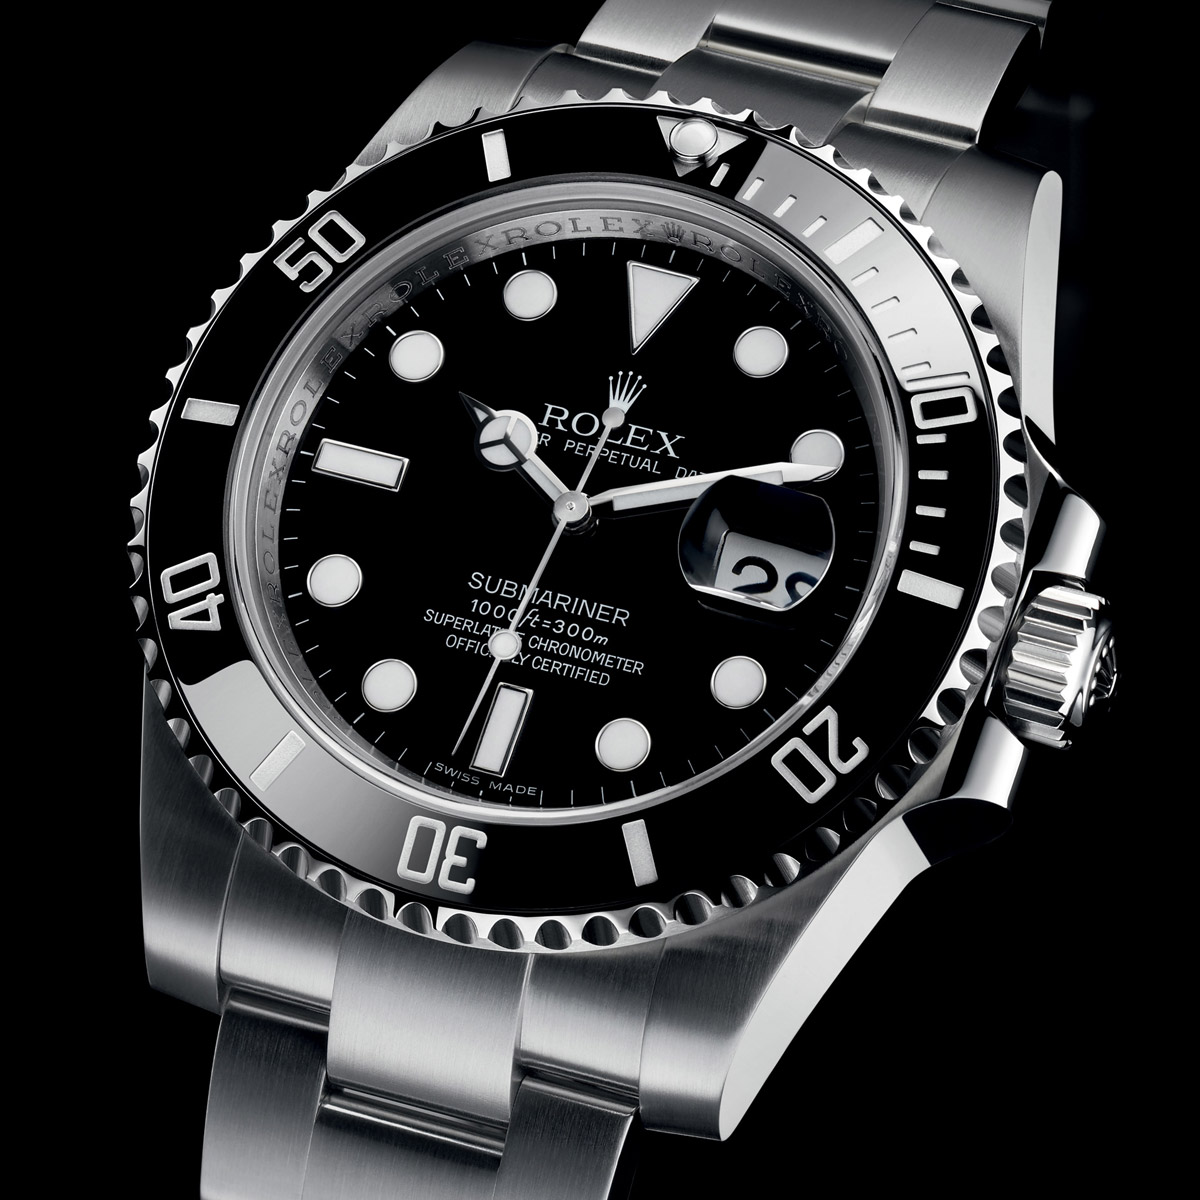 Rolex Oyster Perpetual Submariner Date replica